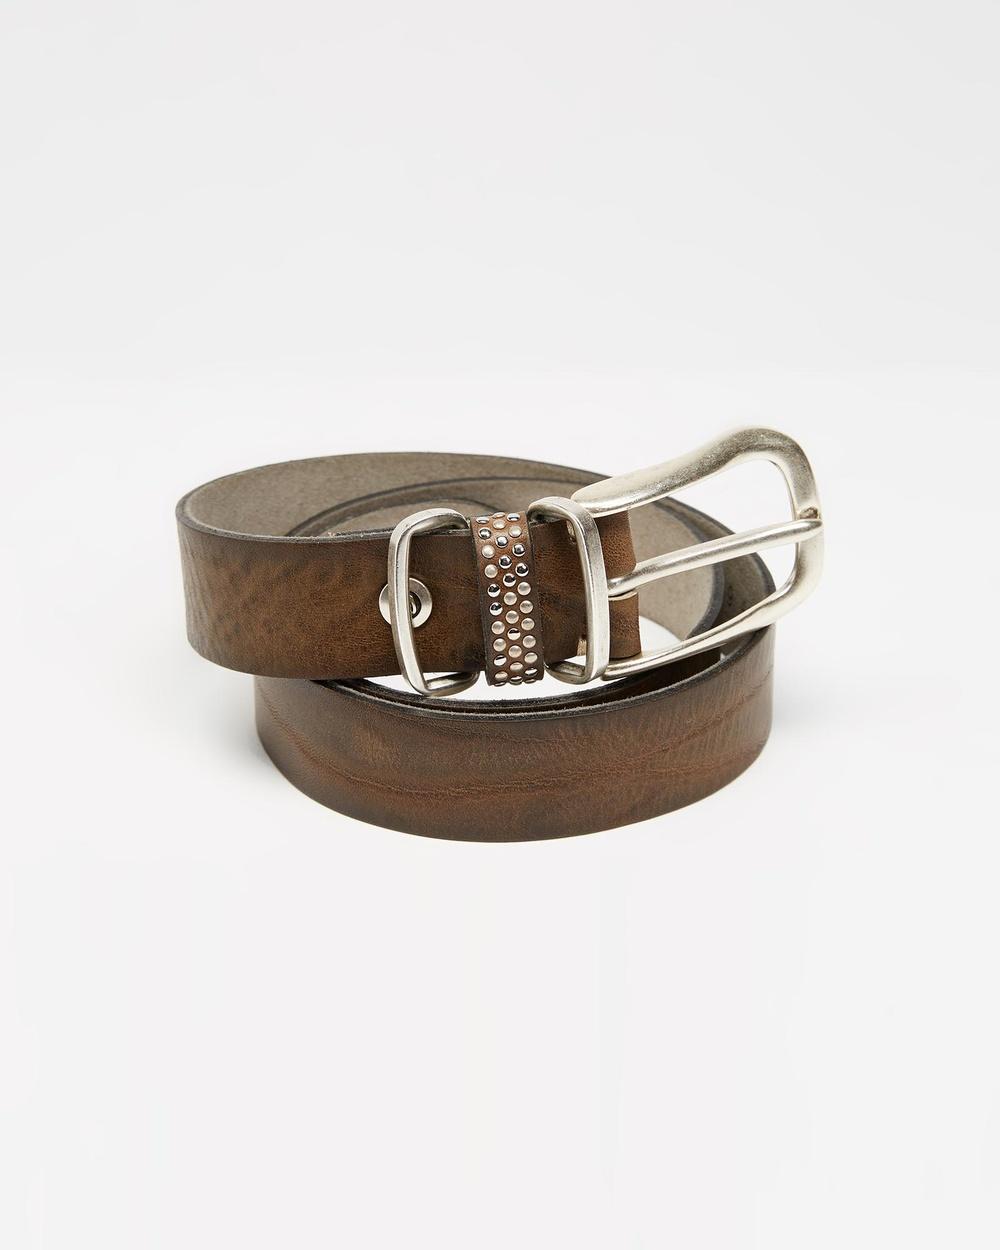 B.Belts Leather Belt With Studded Loop Belts 623